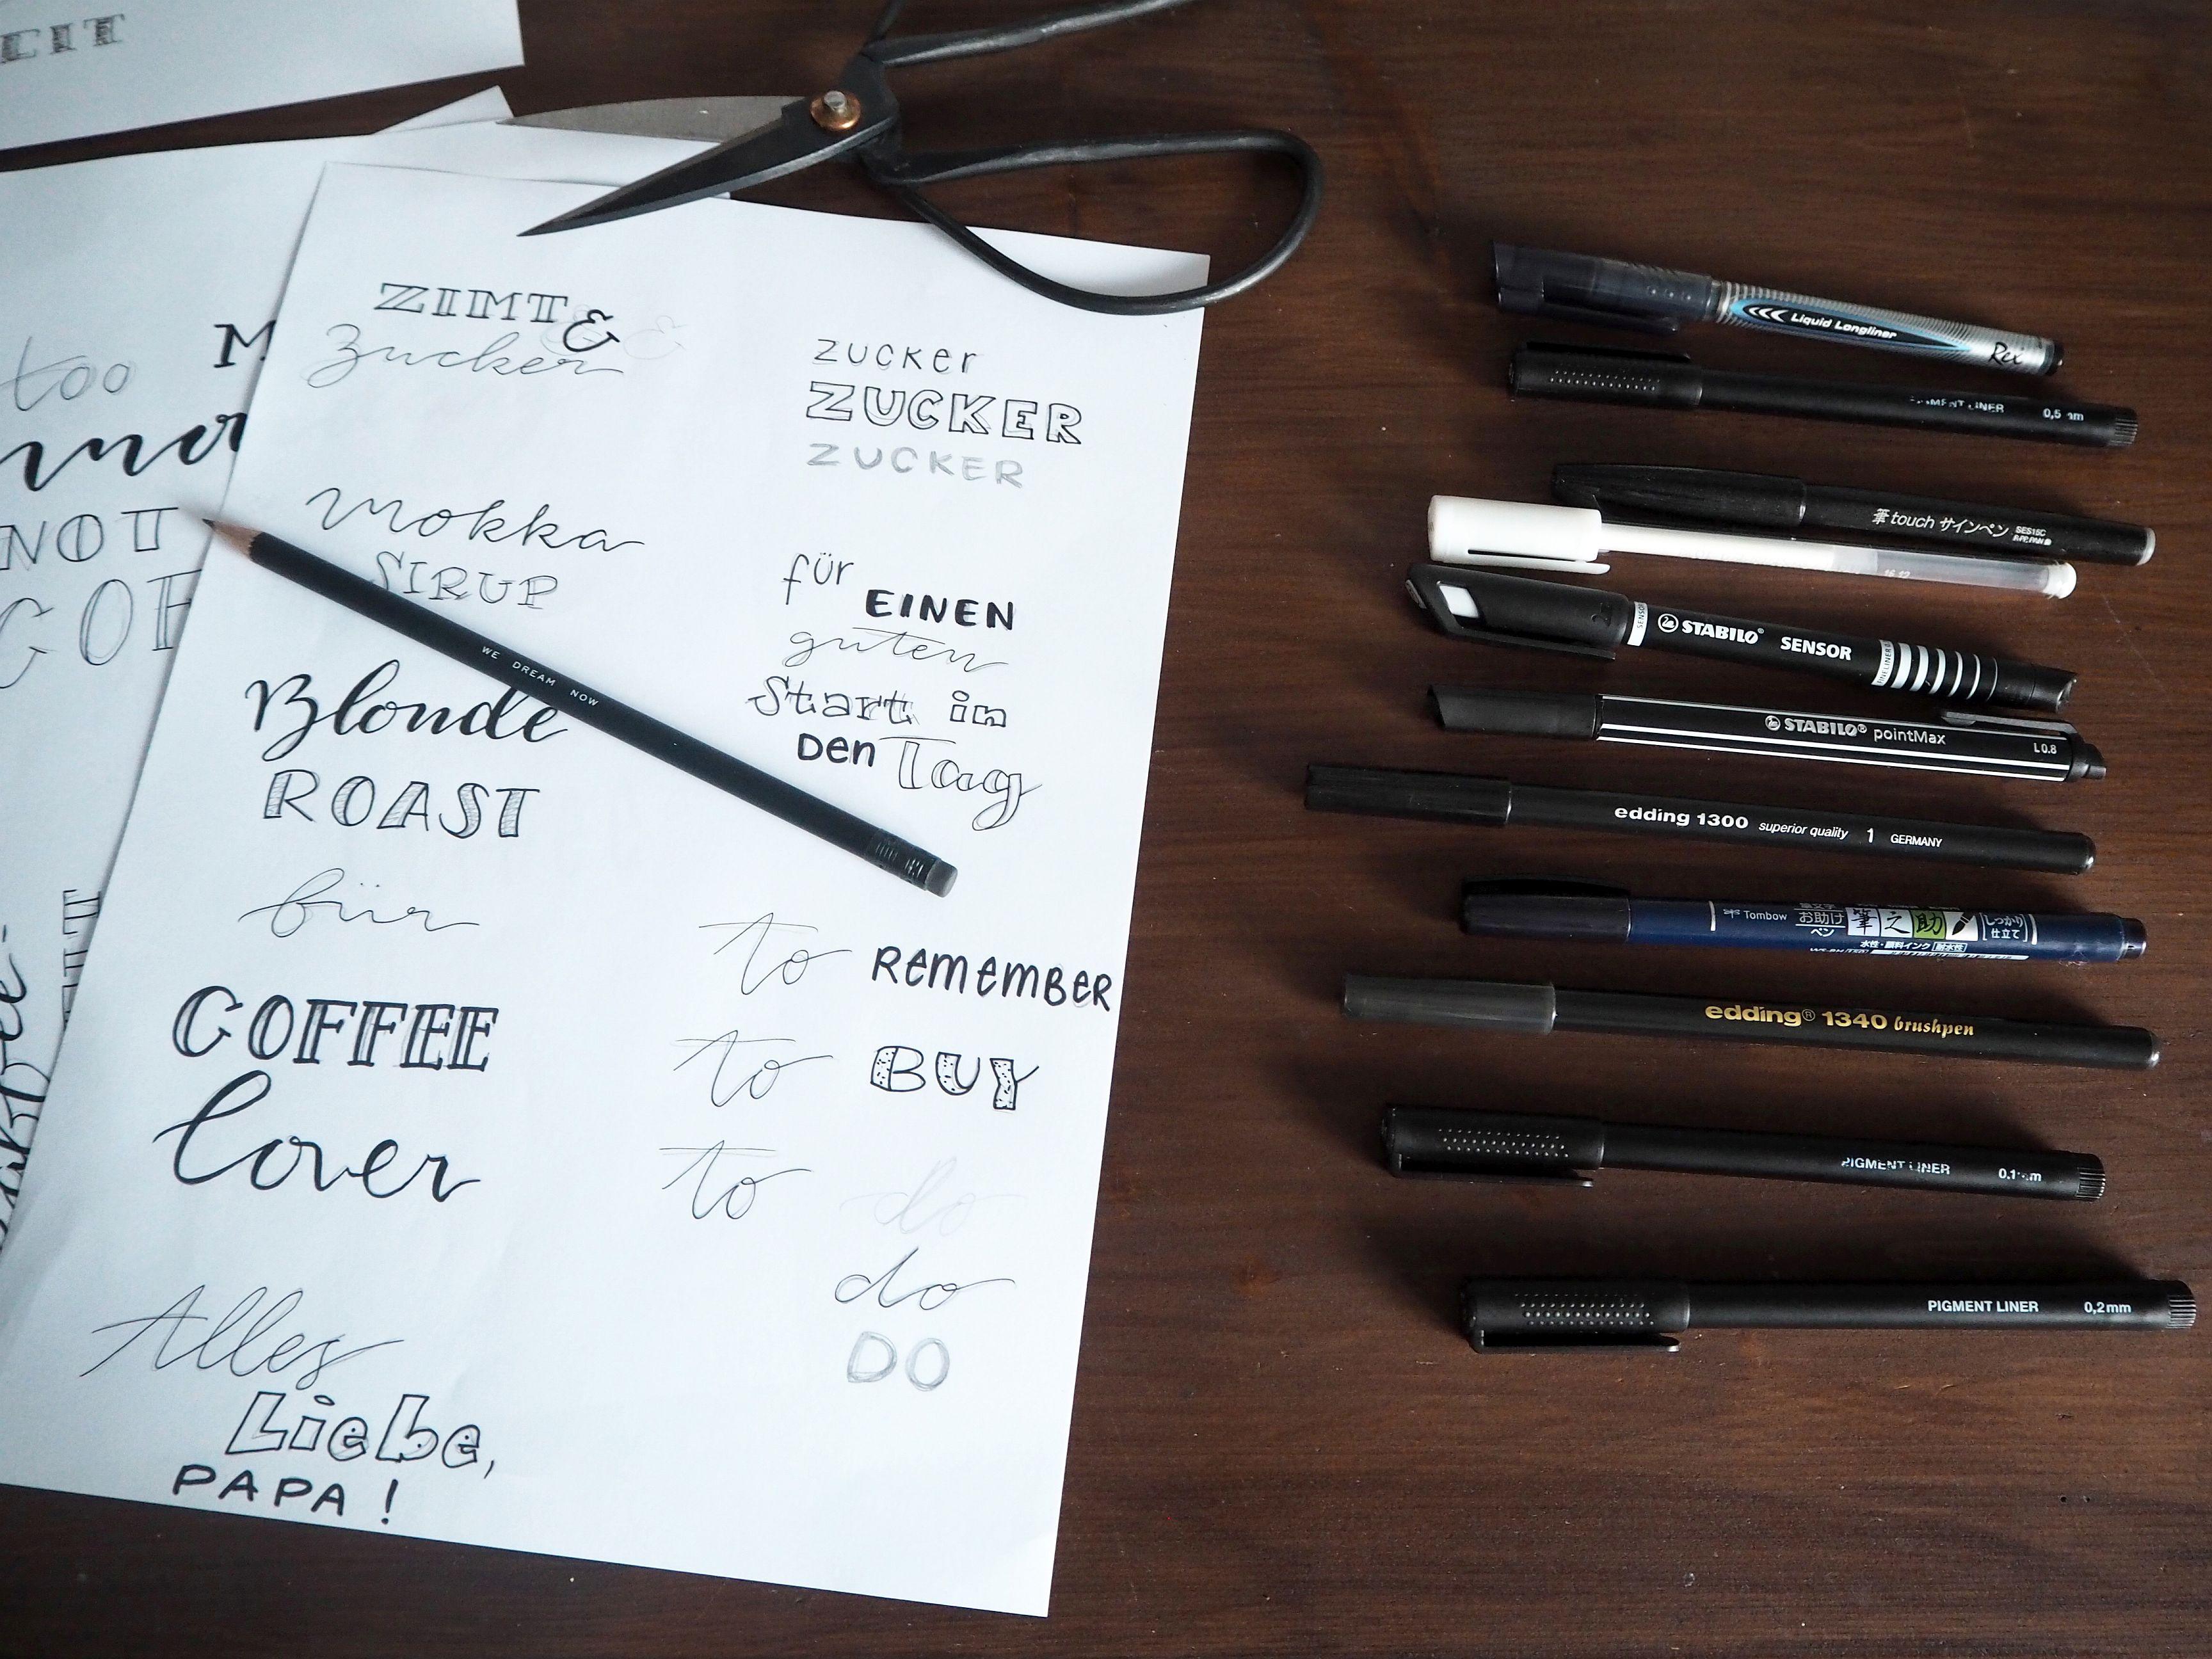 2018-05-skoen-och-kreativ-diy-lettering-set-fuer-kaffee-auszeit-zum-vatertag (12)